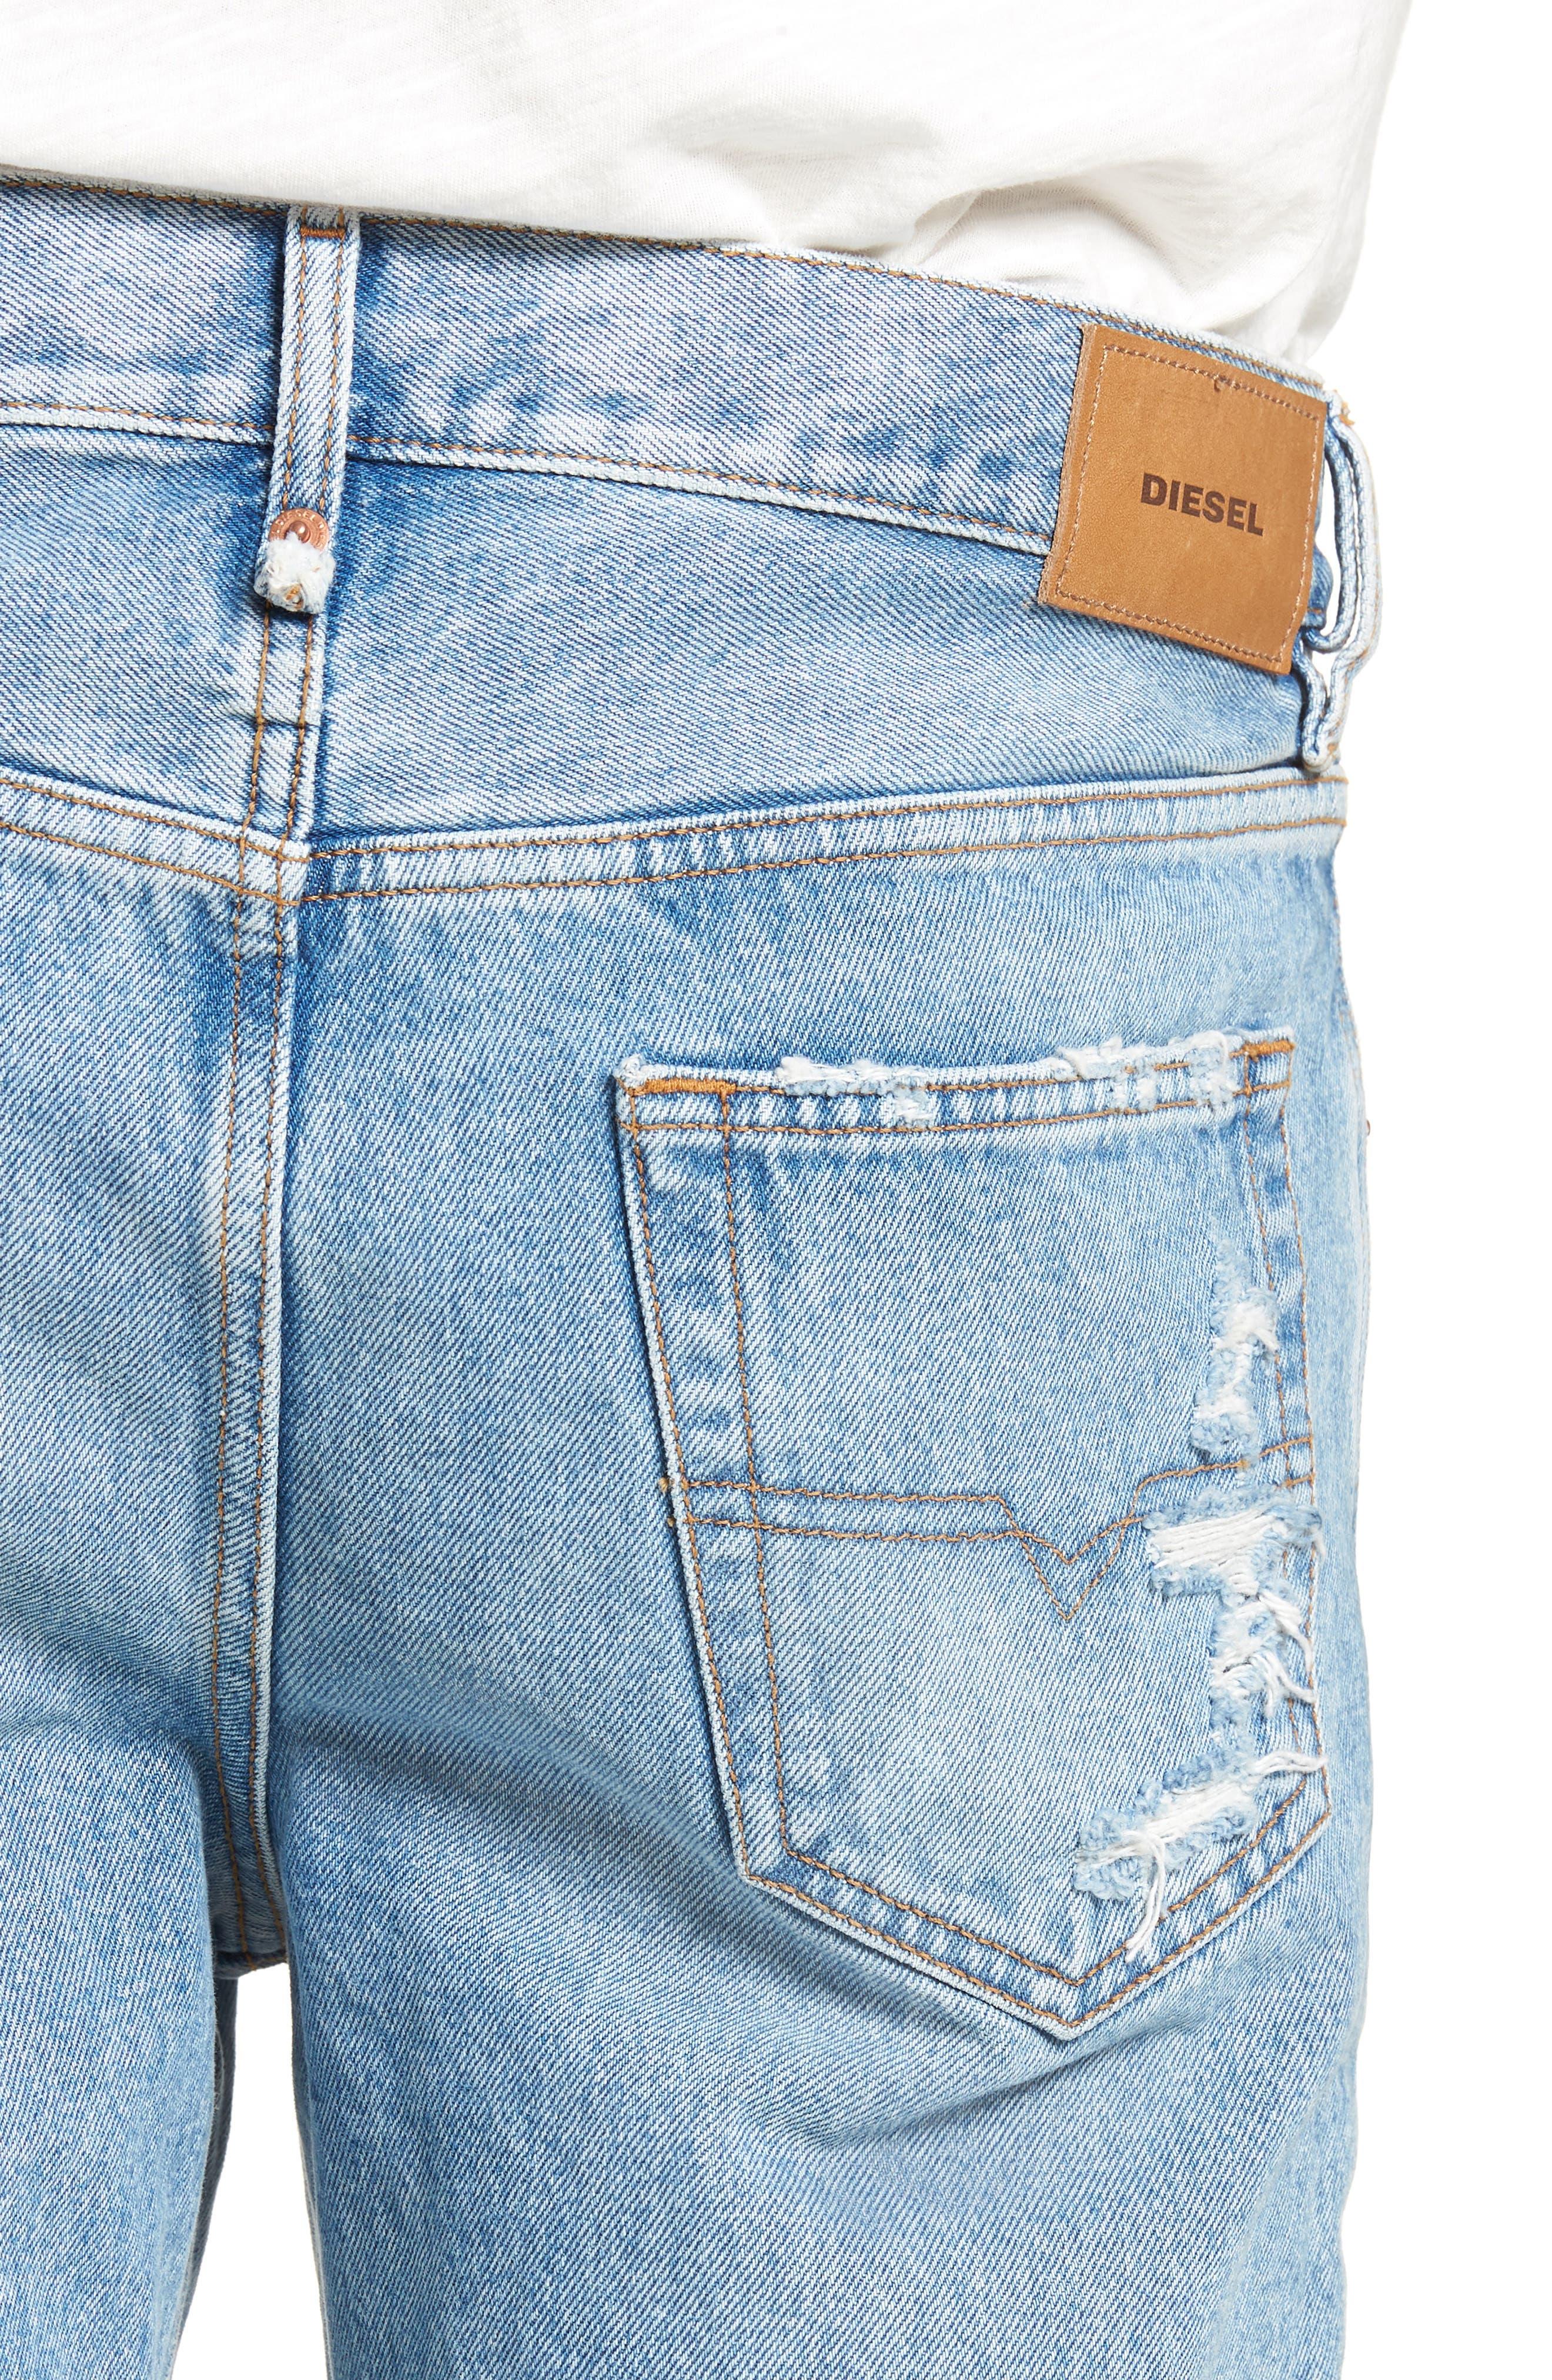 Mharky Slim Straight Leg Jeans,                             Alternate thumbnail 4, color,                             0076M